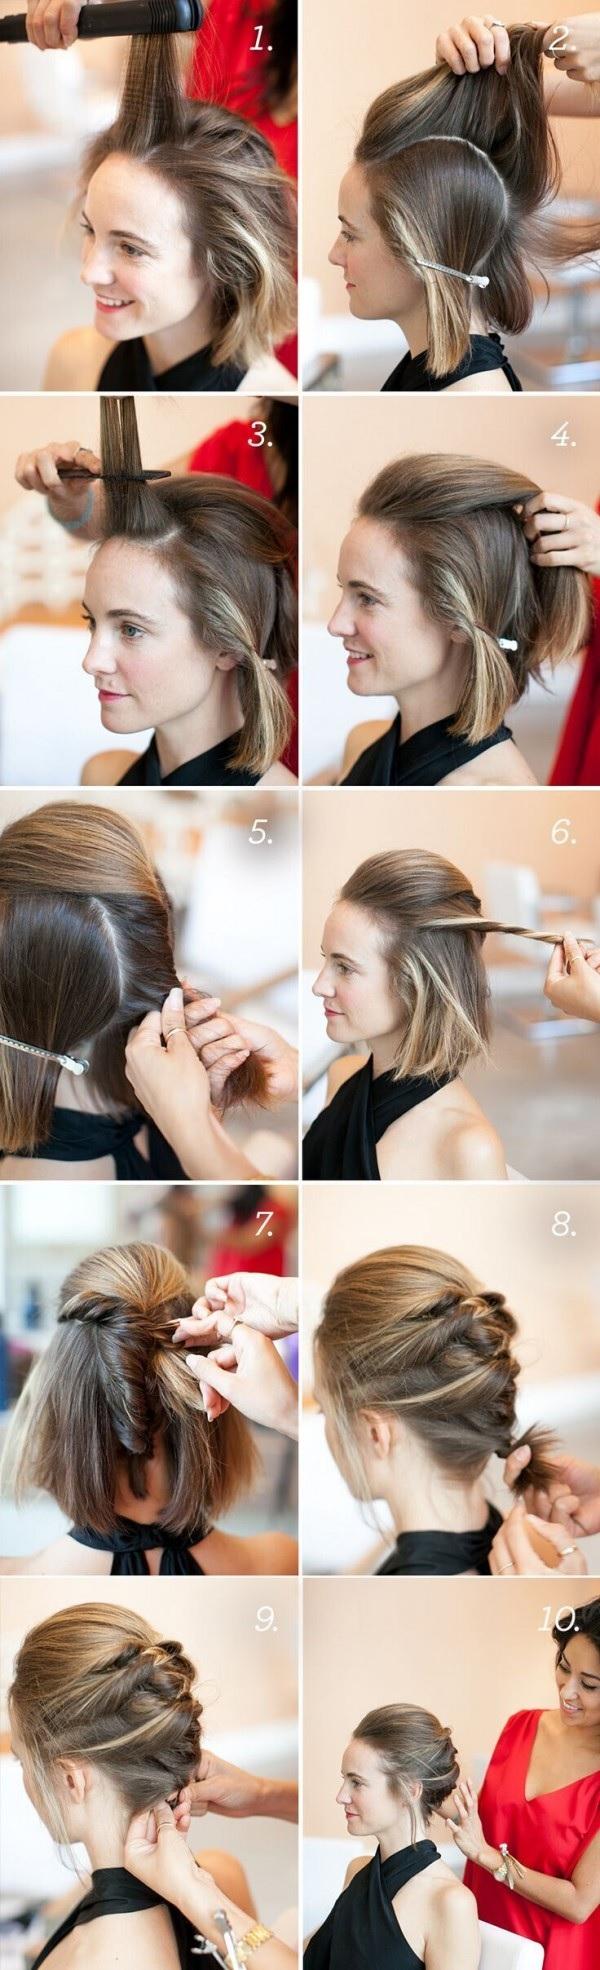 el pelo-corto-1